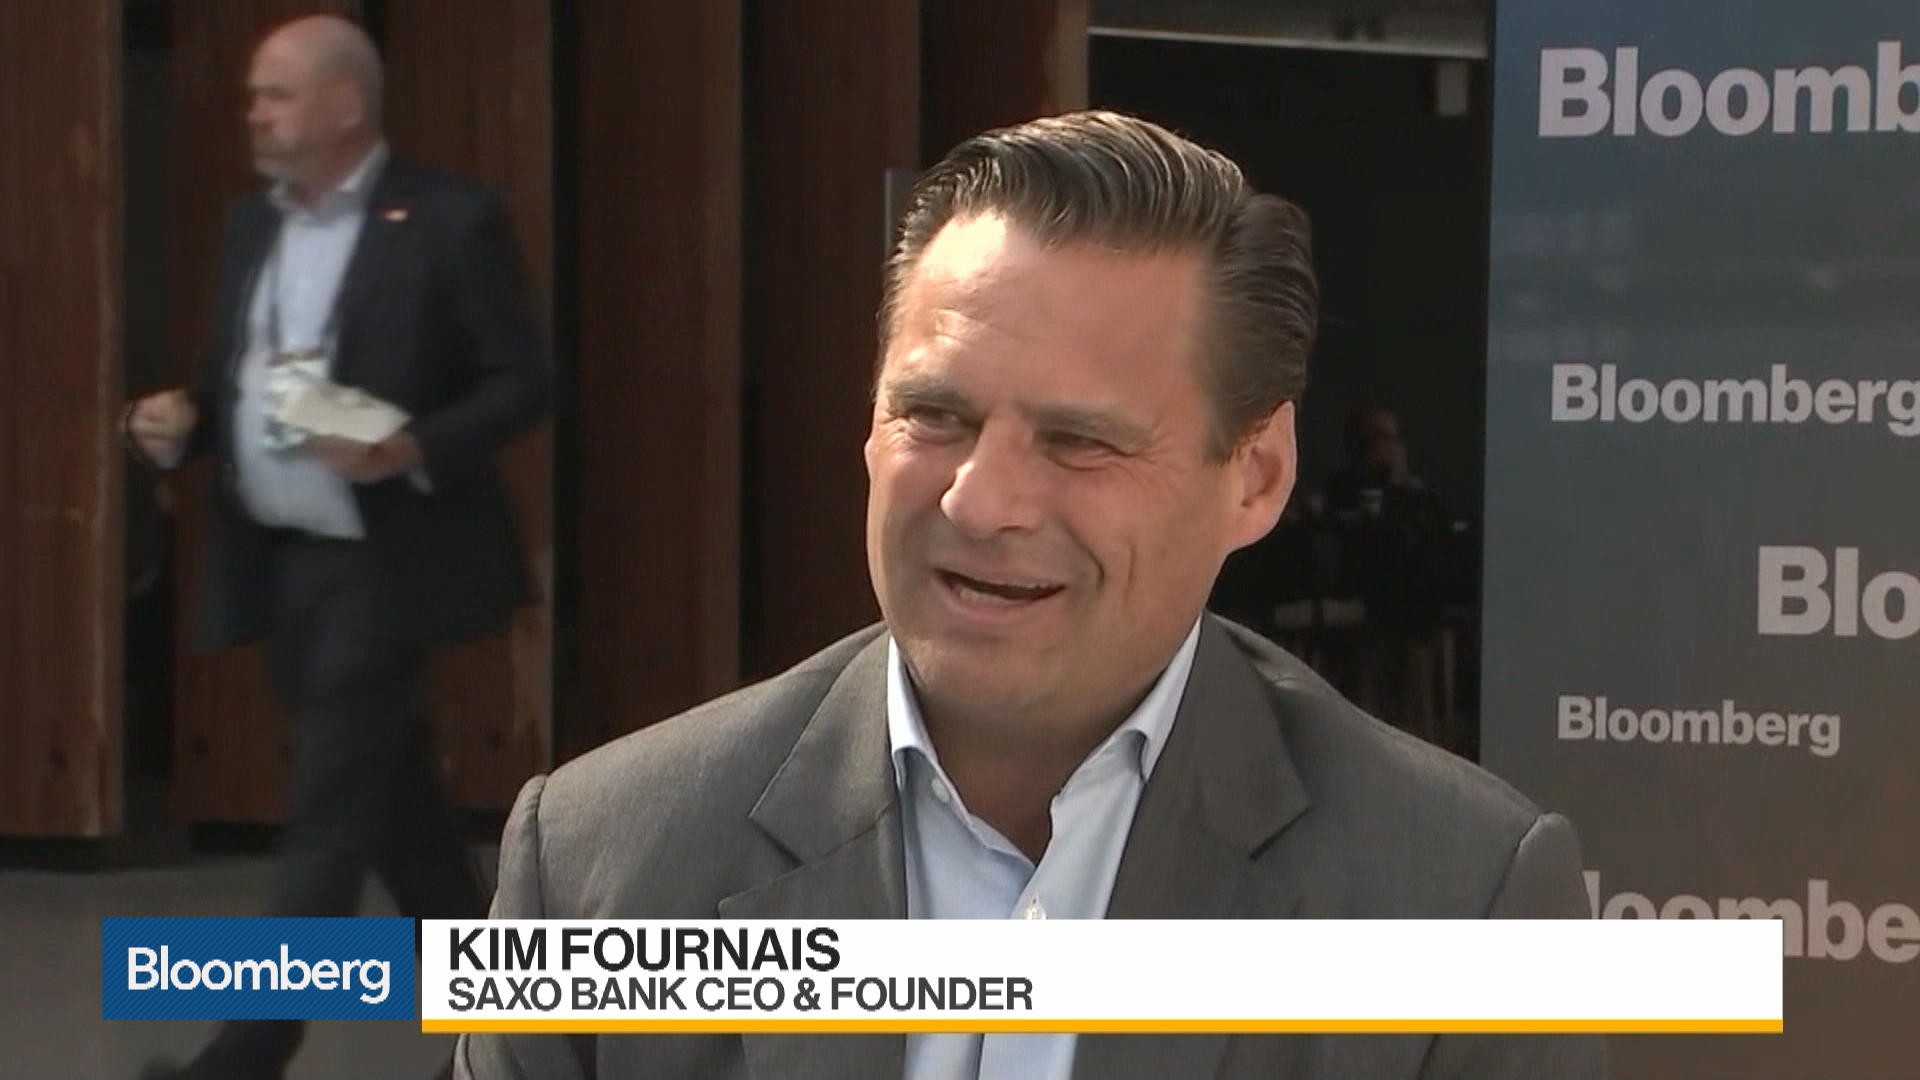 Saxo Bank CEO Kim Fournais Sees Low Volatility as the New Normal